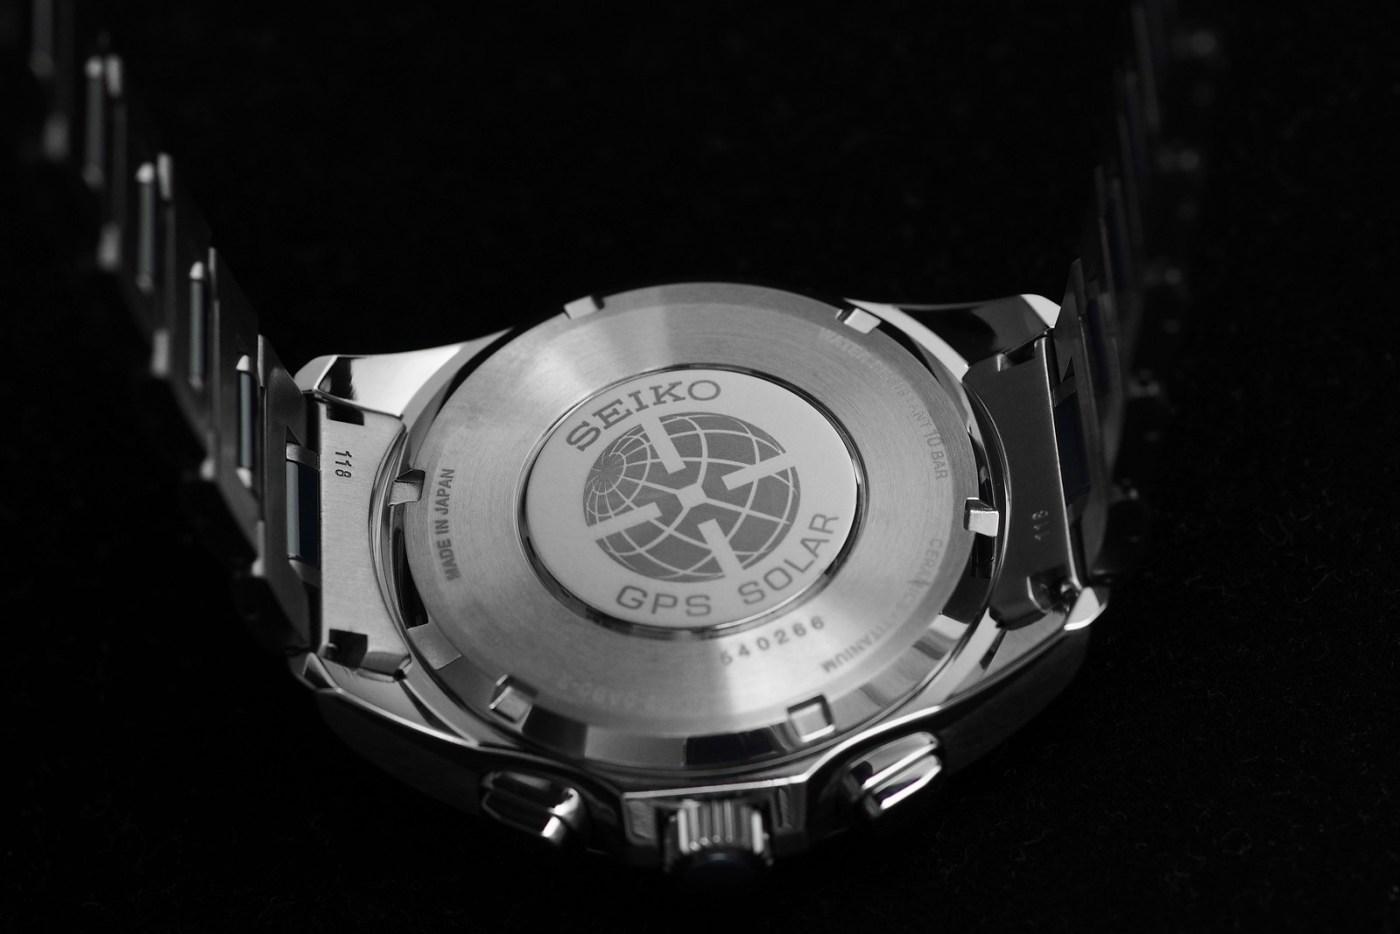 Seiko Astron GPS Solar Dual-Time caseback